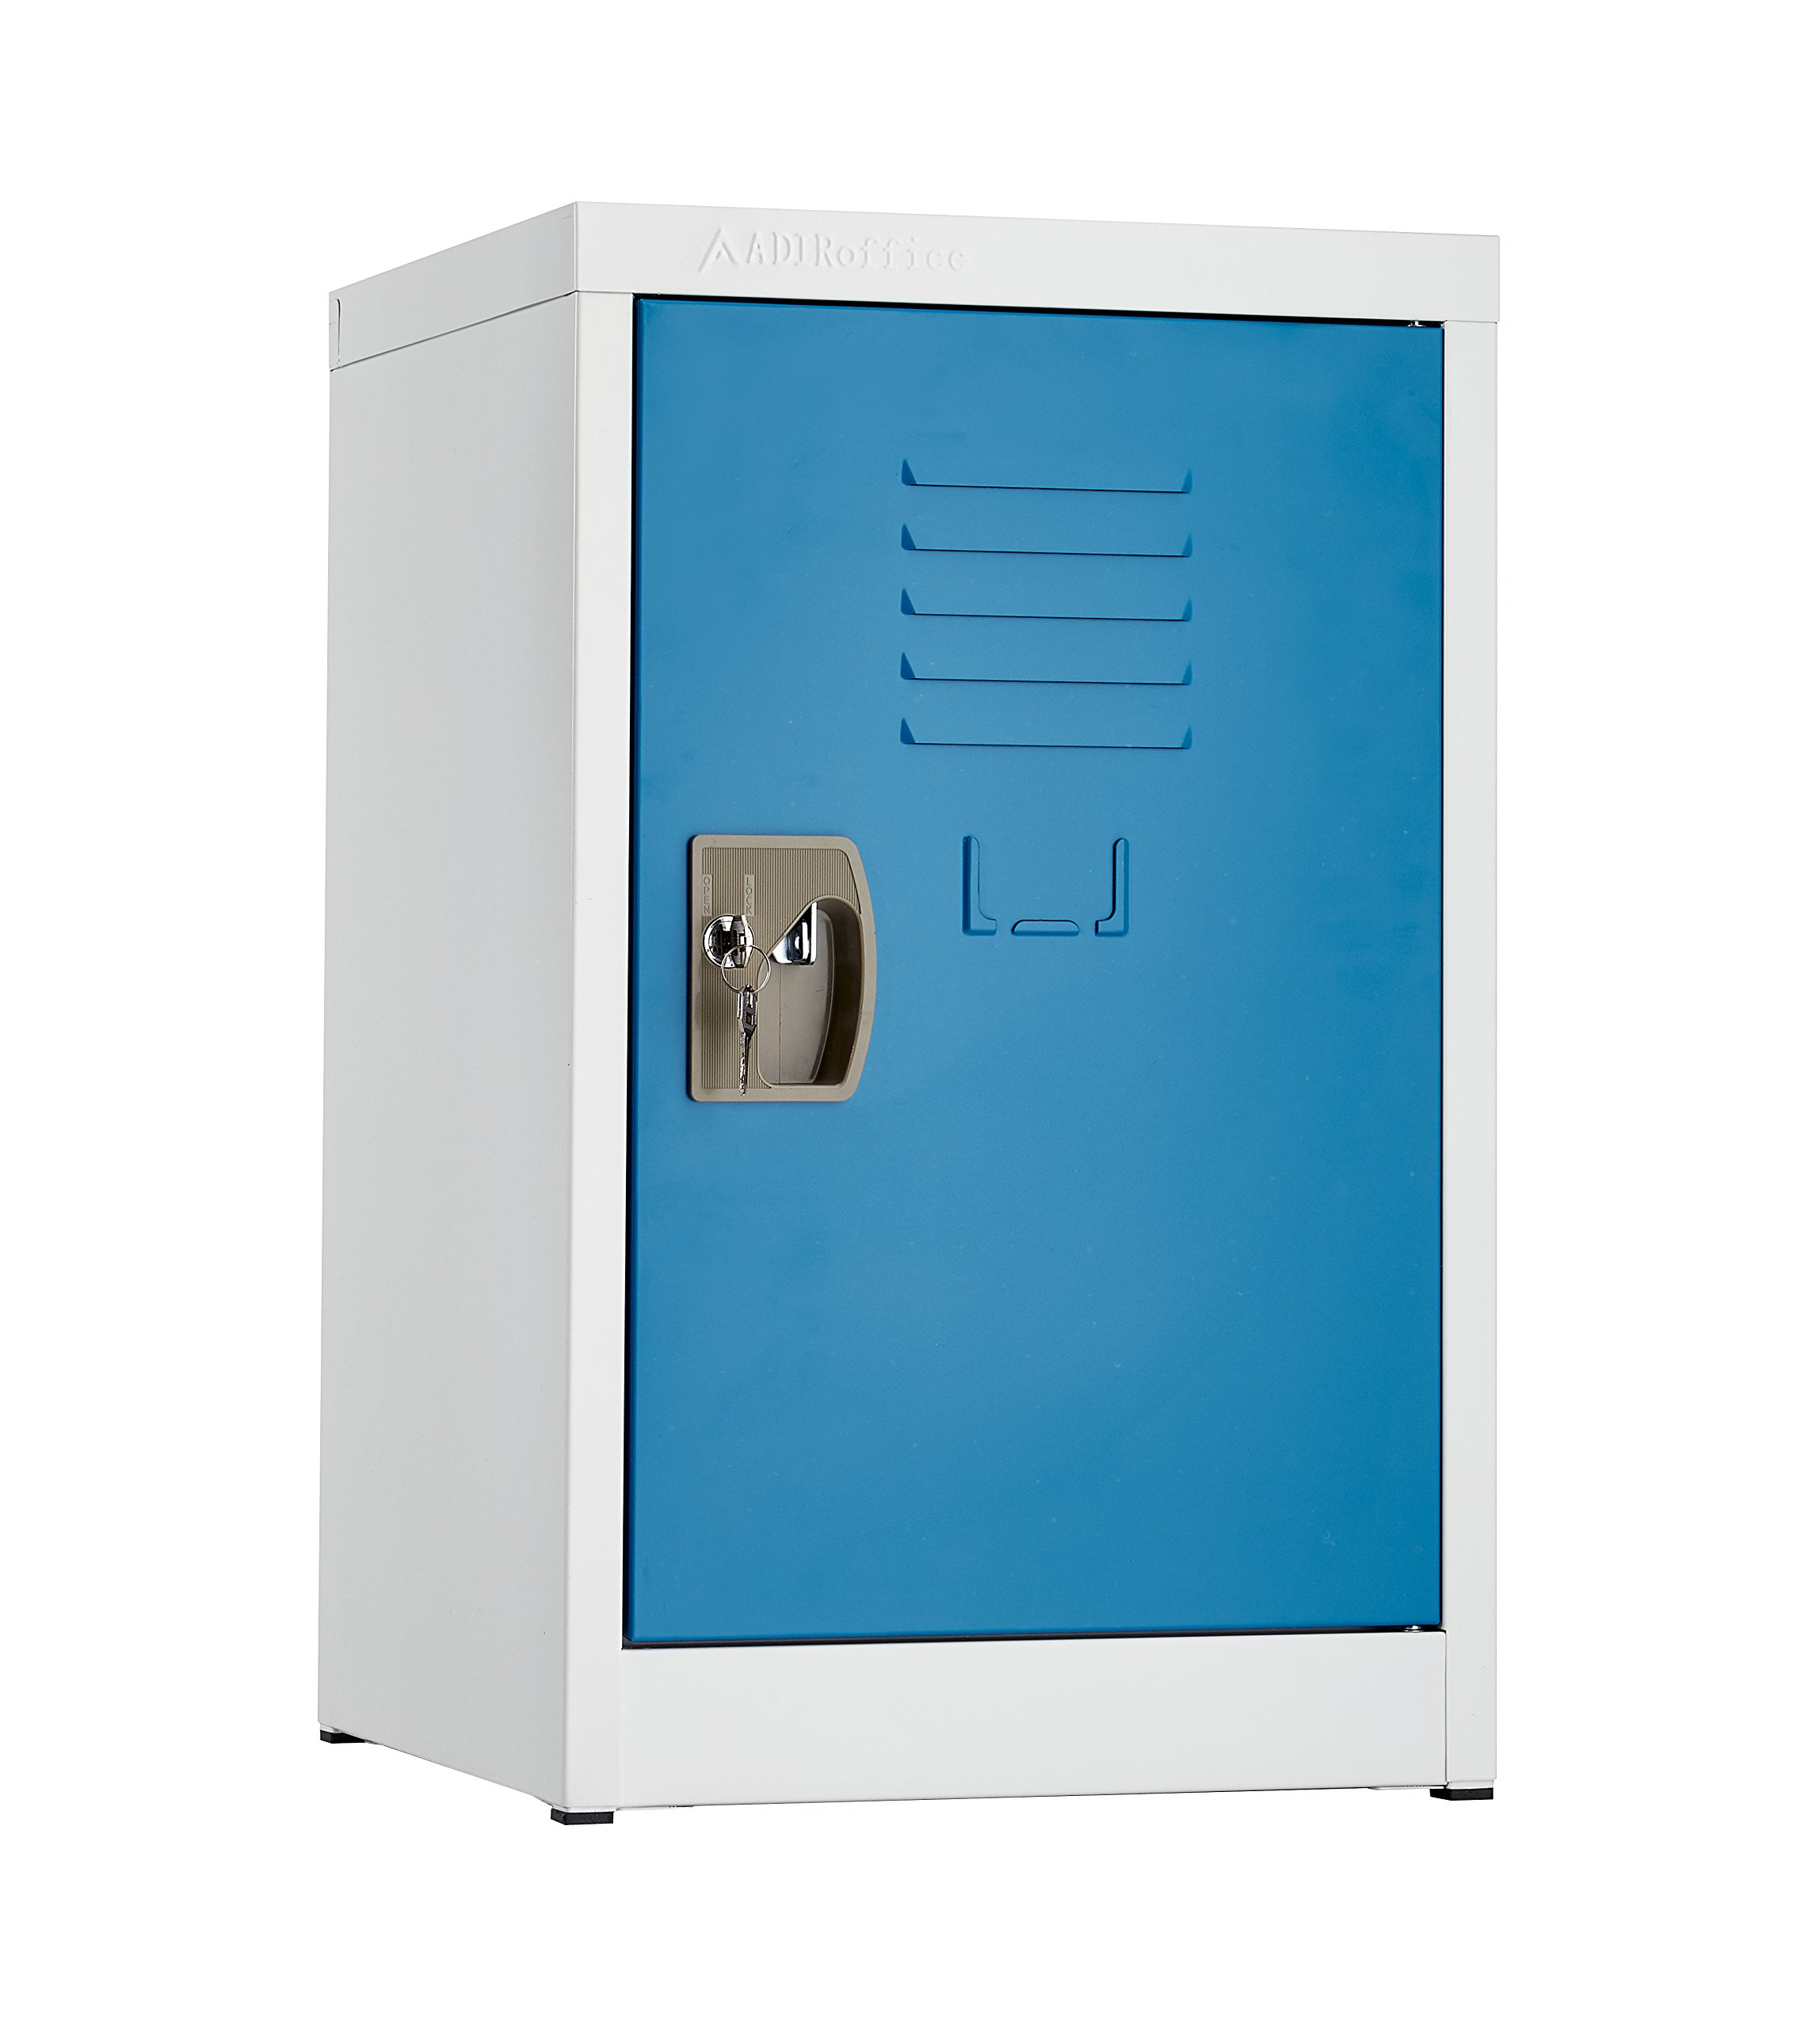 AdirOffice Kids Steel Metal Storage Locker - for Home & School - with Key & Hanging Rods (24 Inch, Blue) by AdirOffice